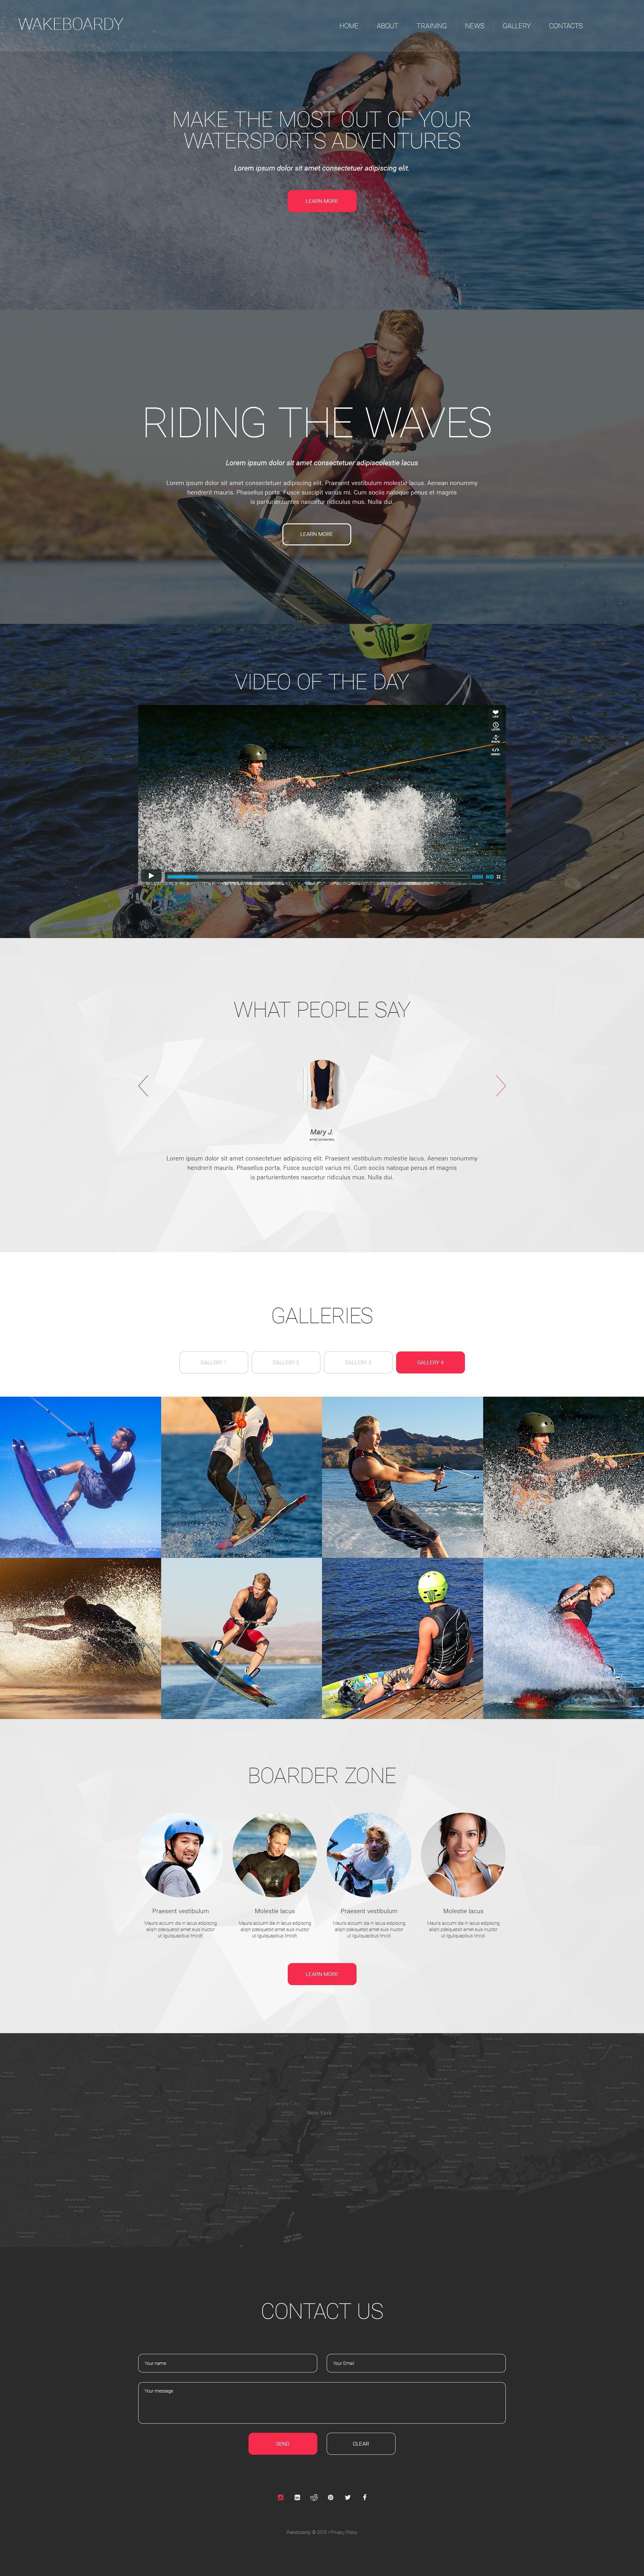 "Website Vorlage namens ""Wakeboardy"" #55105"